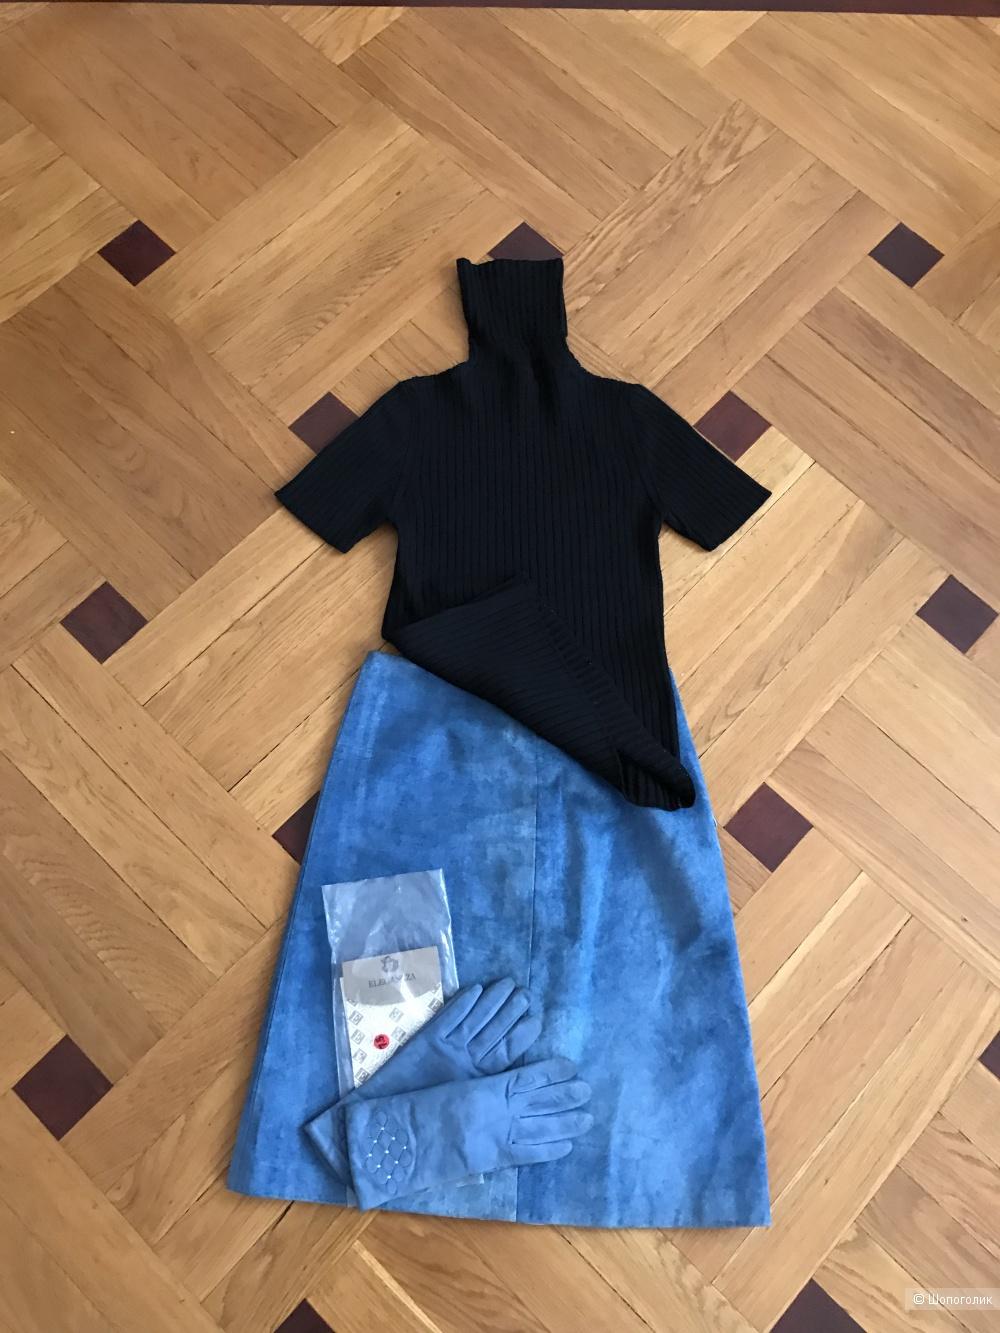 Комплект юбка замша Calvin Klein/перчатки No Brand 7,5/водолазка-безрукавка Alain Manoukian,44 рус